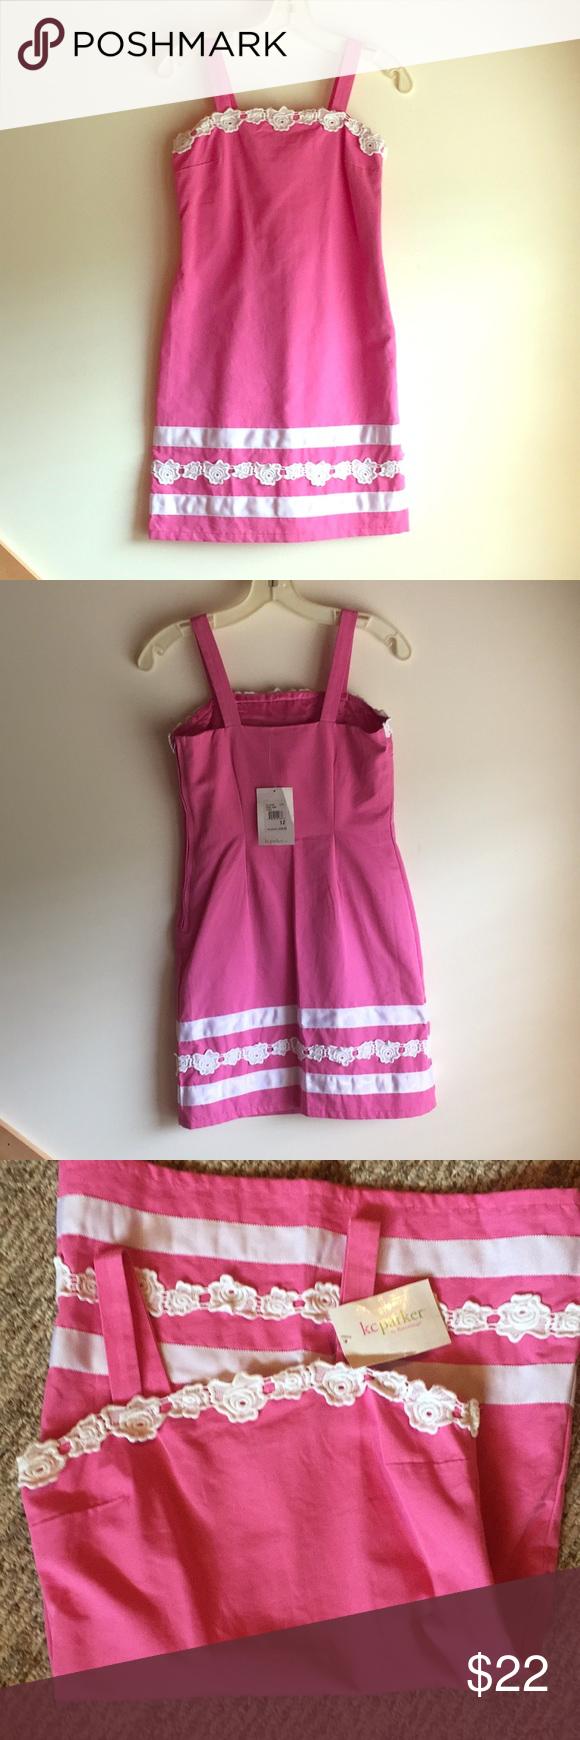 KC Parker by Hartstrings sundress - pink   Sundress, Pink, White trim